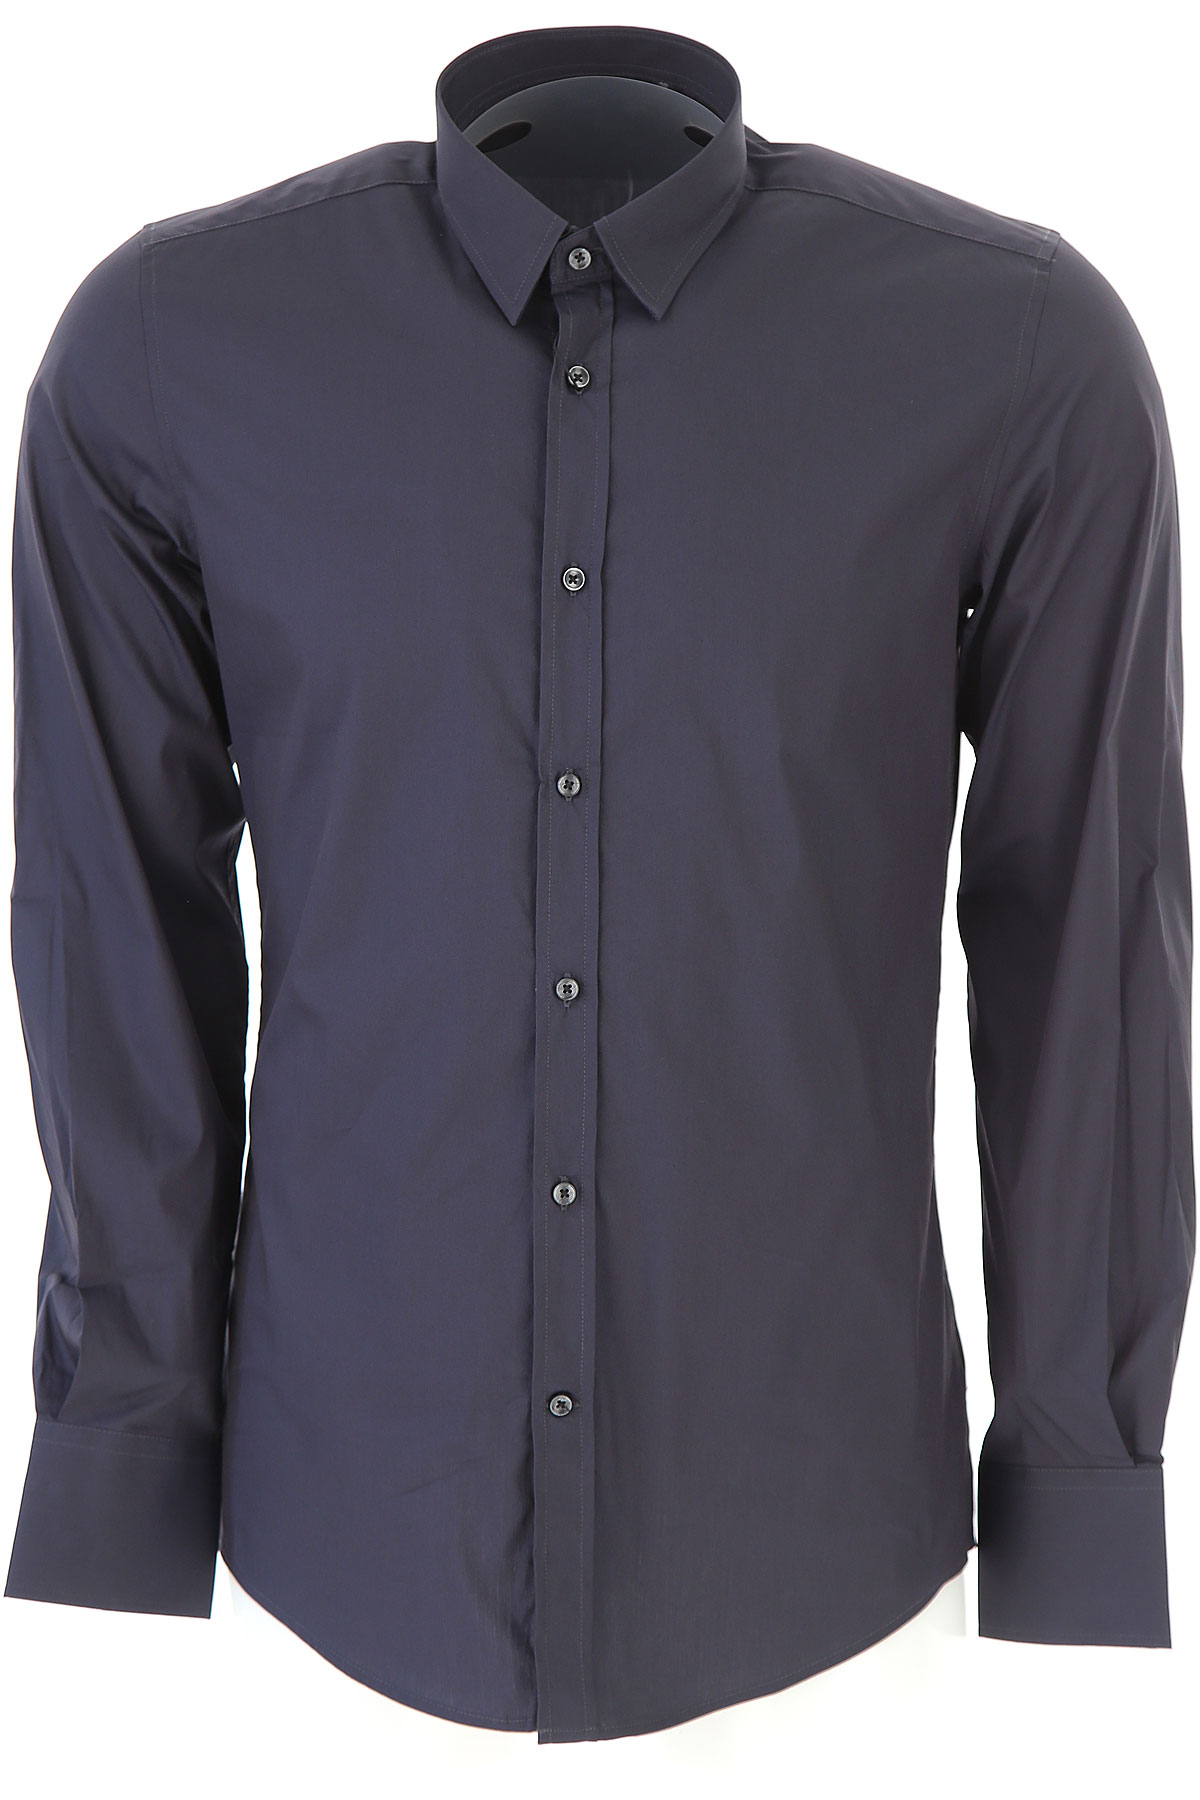 Image of Antony Morato Shirt for Men, Anthracite Grey, Cotton, 2017, L M S XL XS XXL